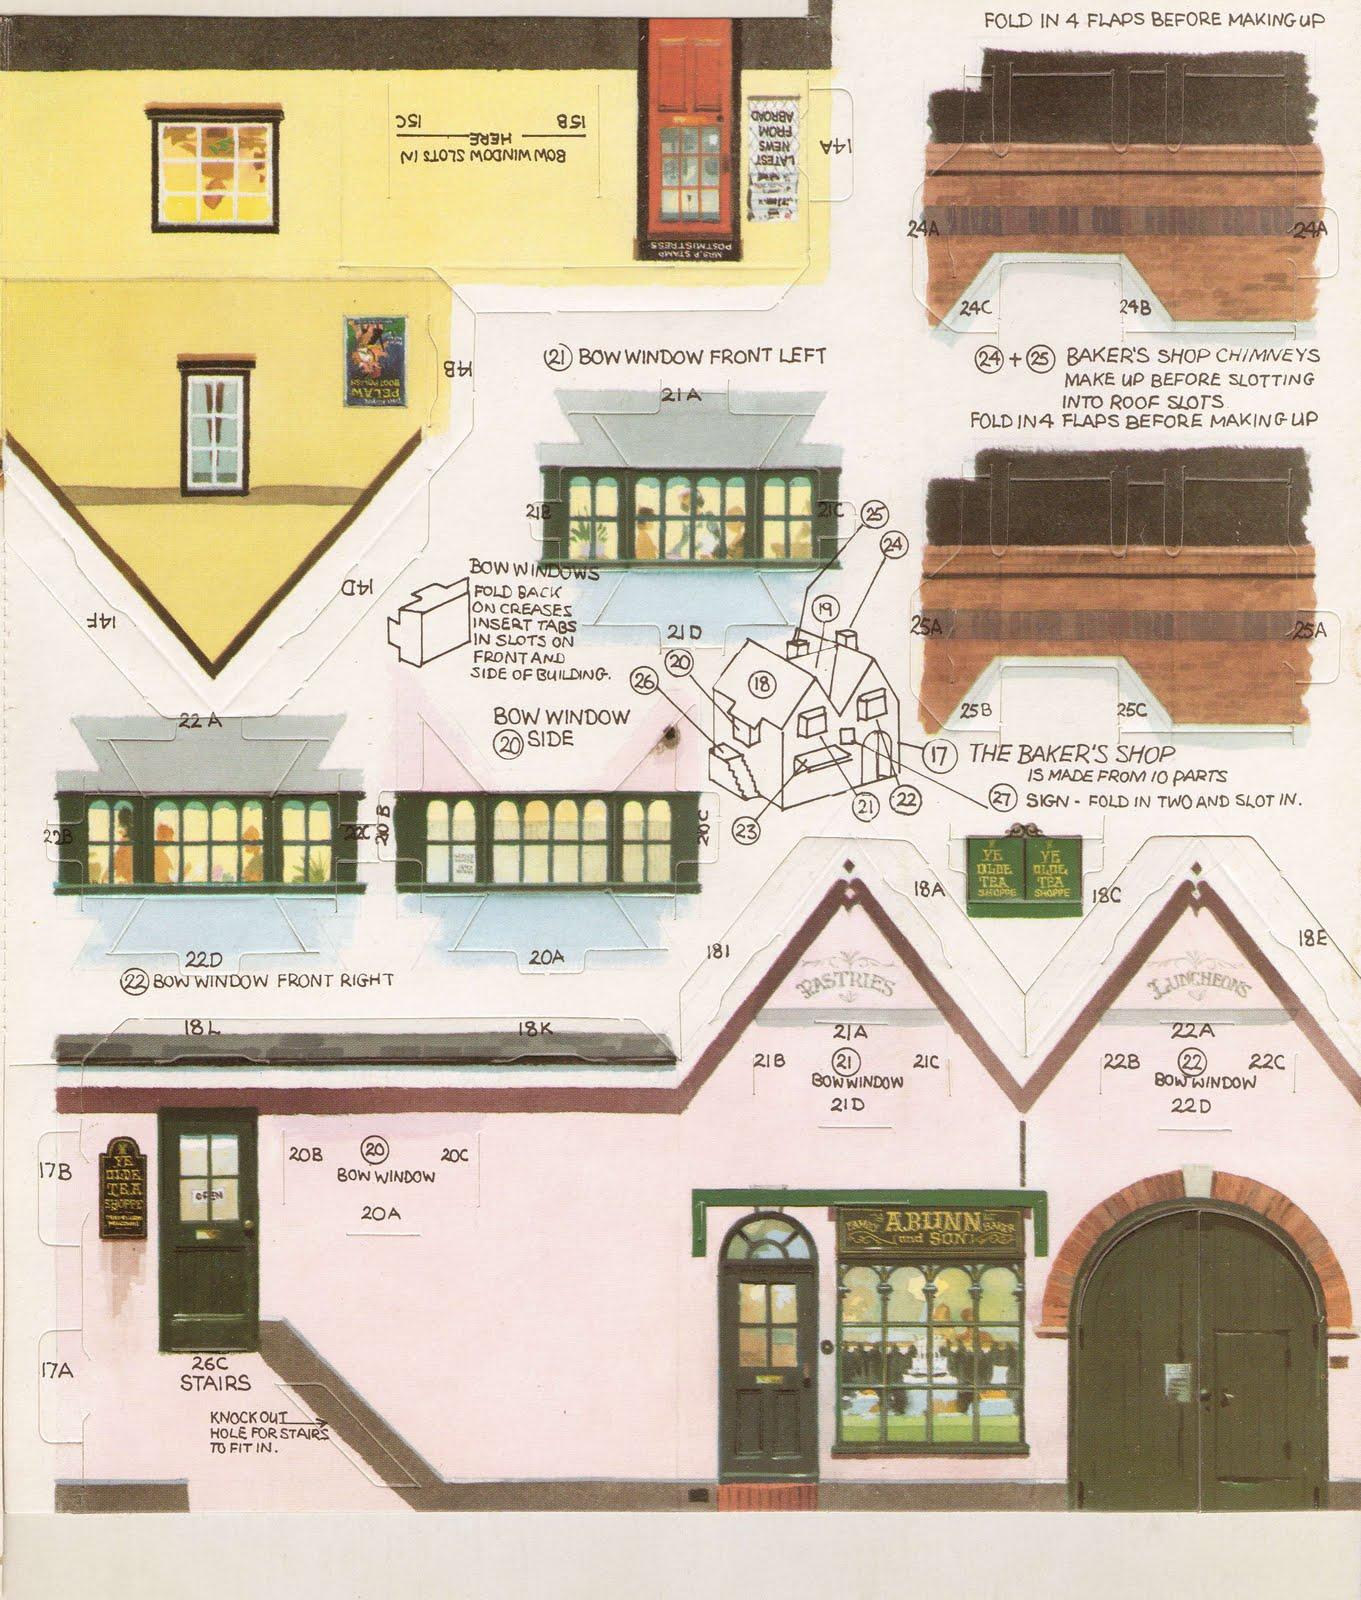 Printable houses on pinterest paper models paper houses for Building model houses